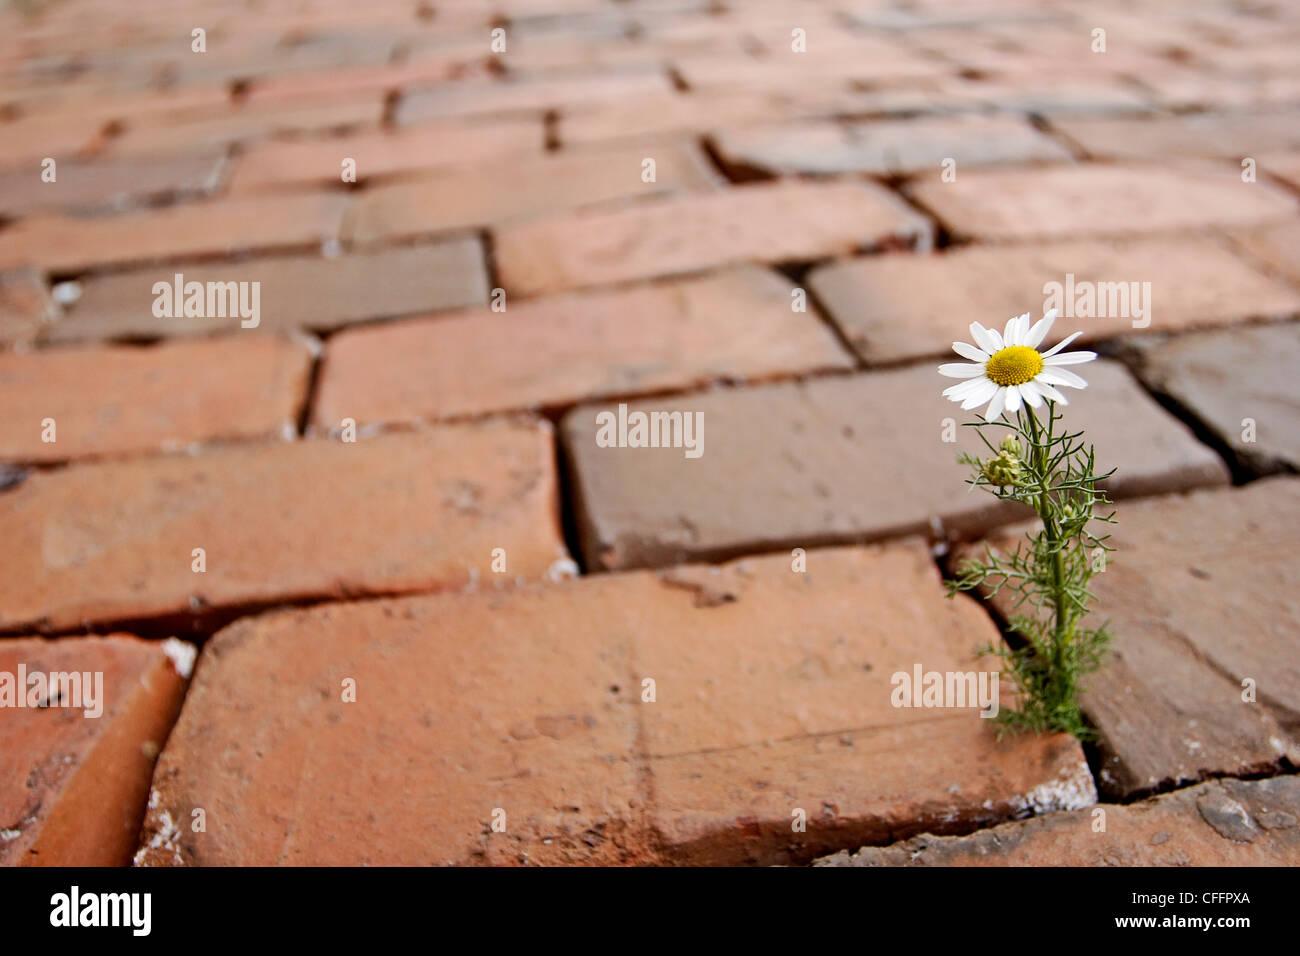 Single Flower in Cobblestones - Stock Image